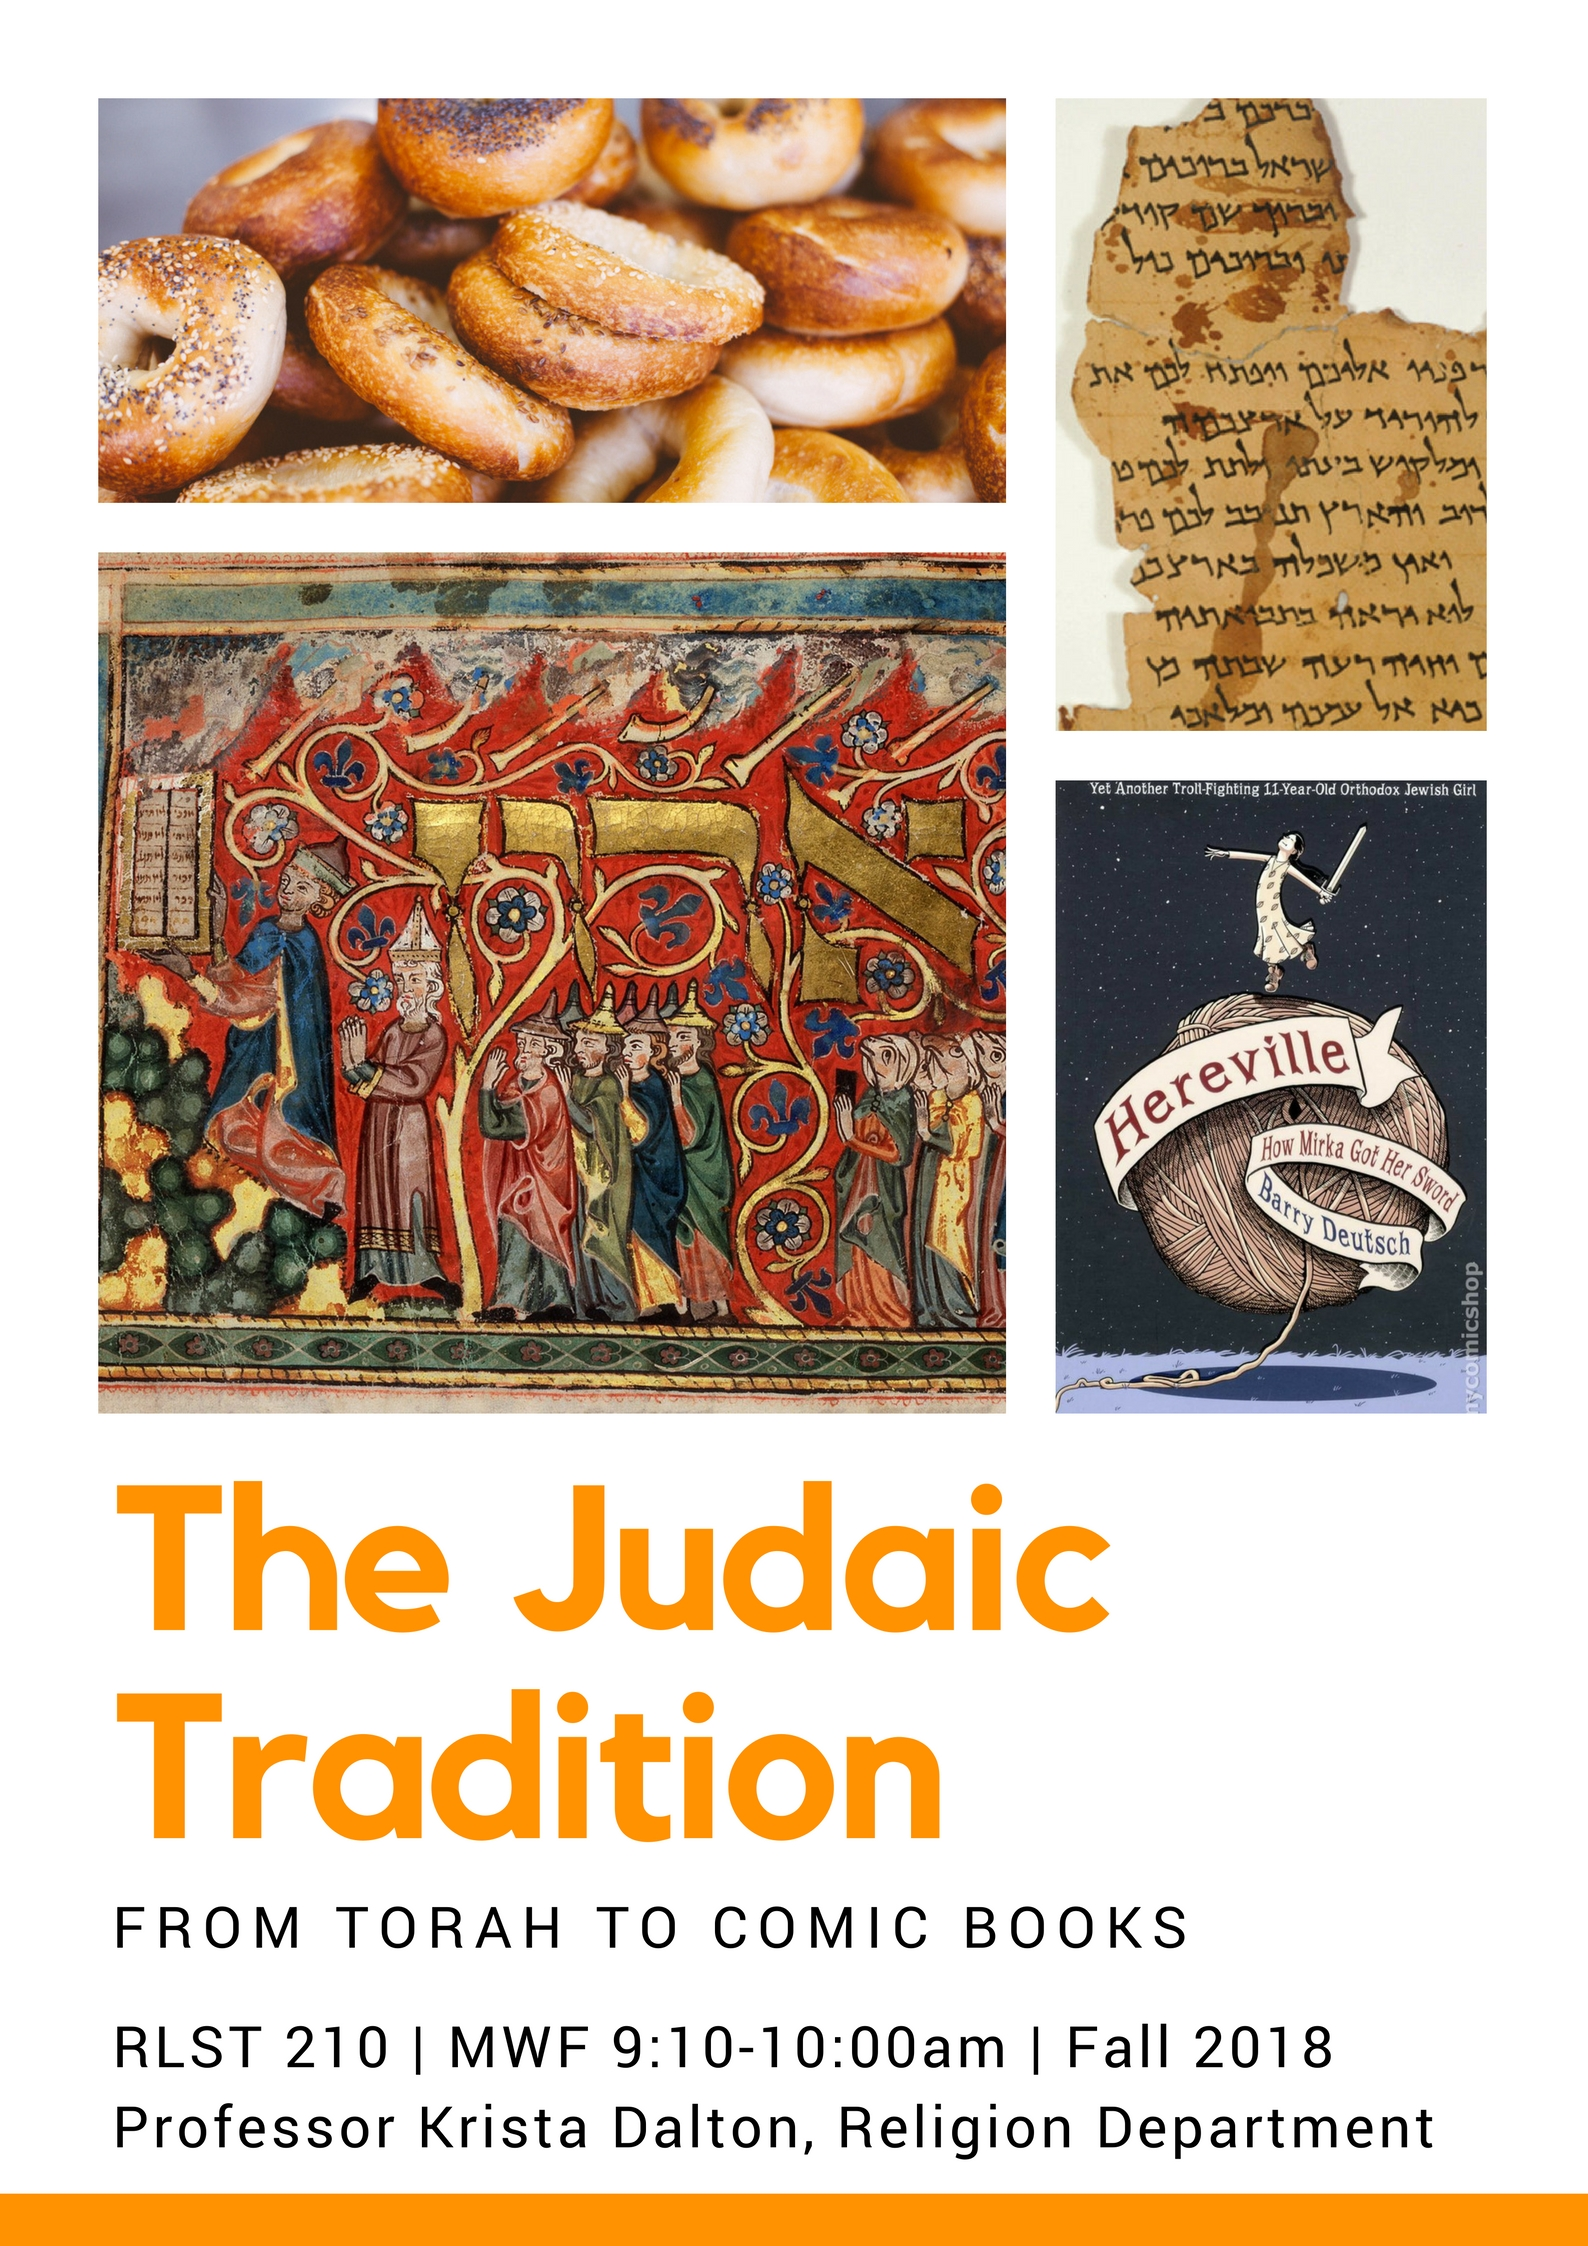 JudaicTradition.jpg